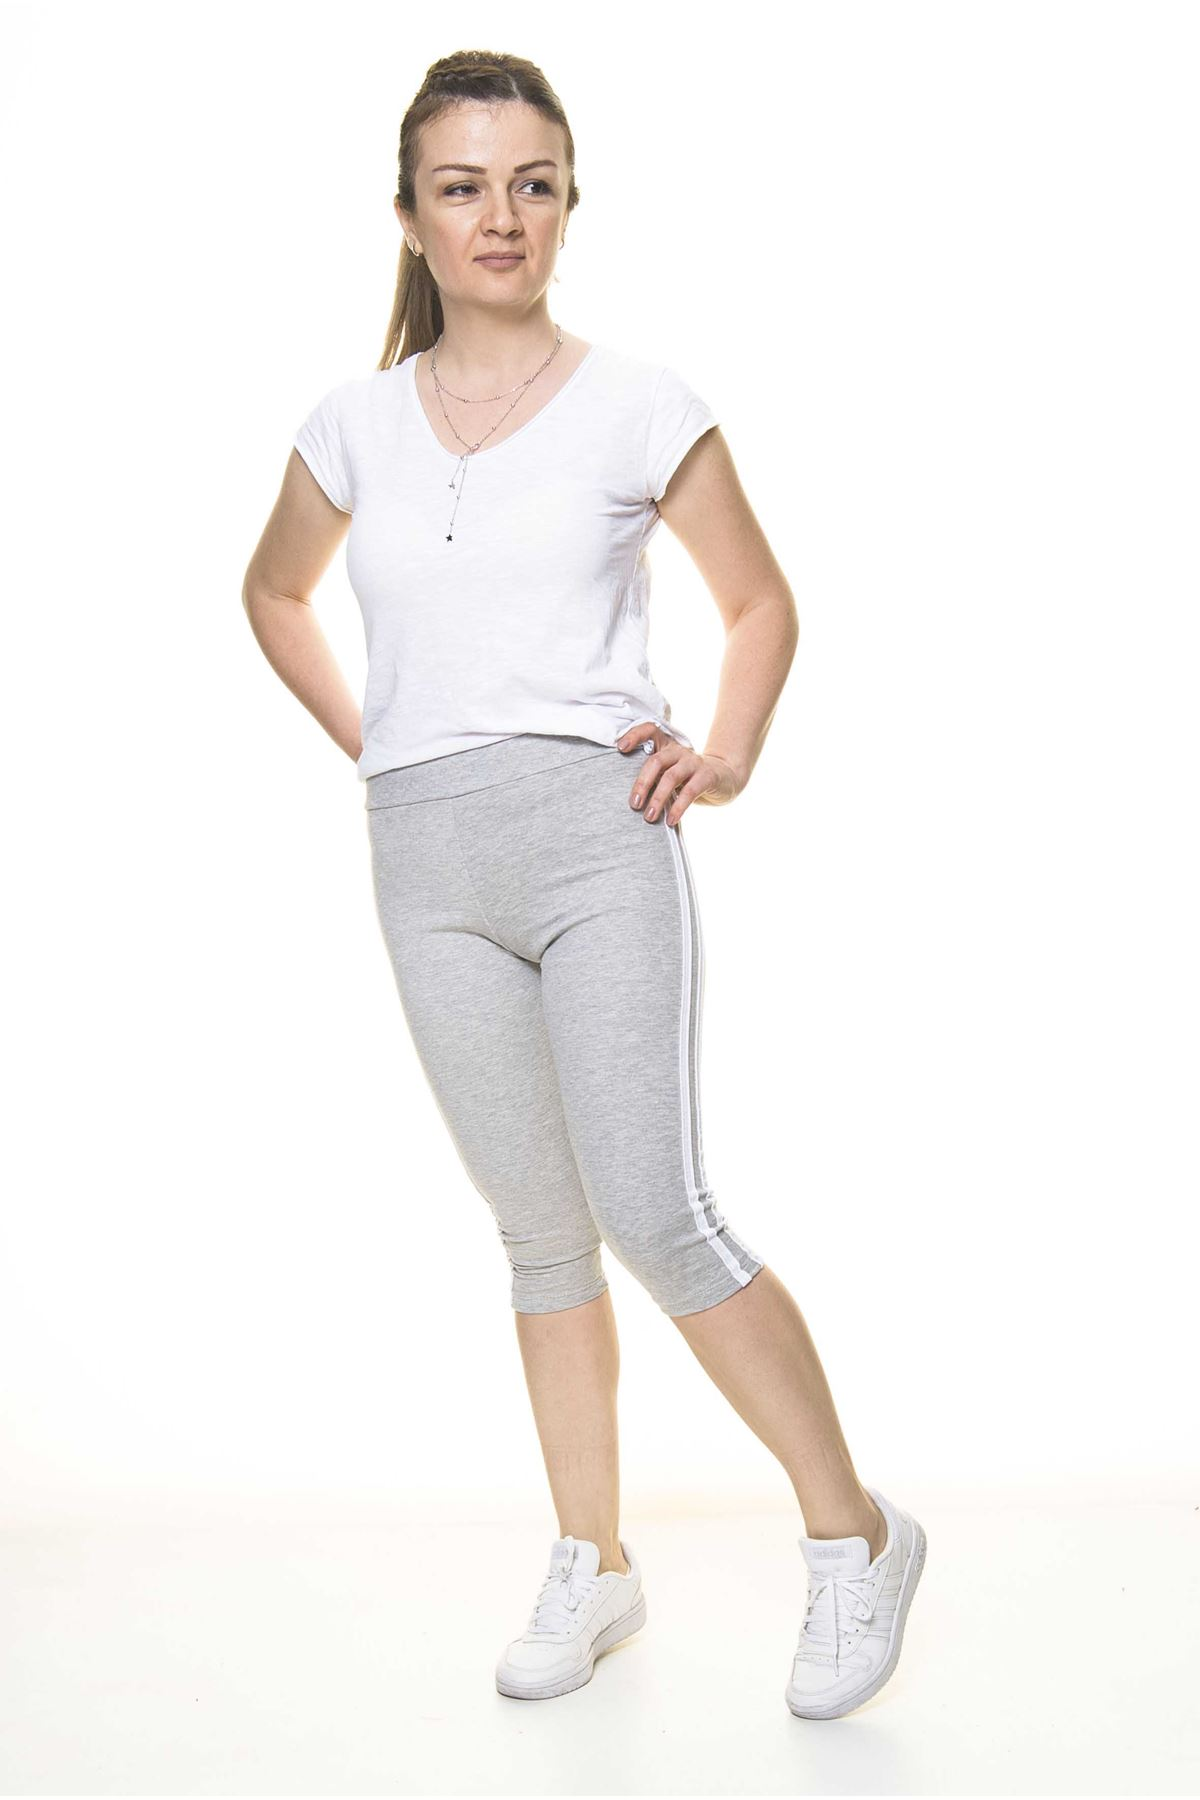 Kadın Spor Çizgili Gri Kapri Tayt 11C-4015